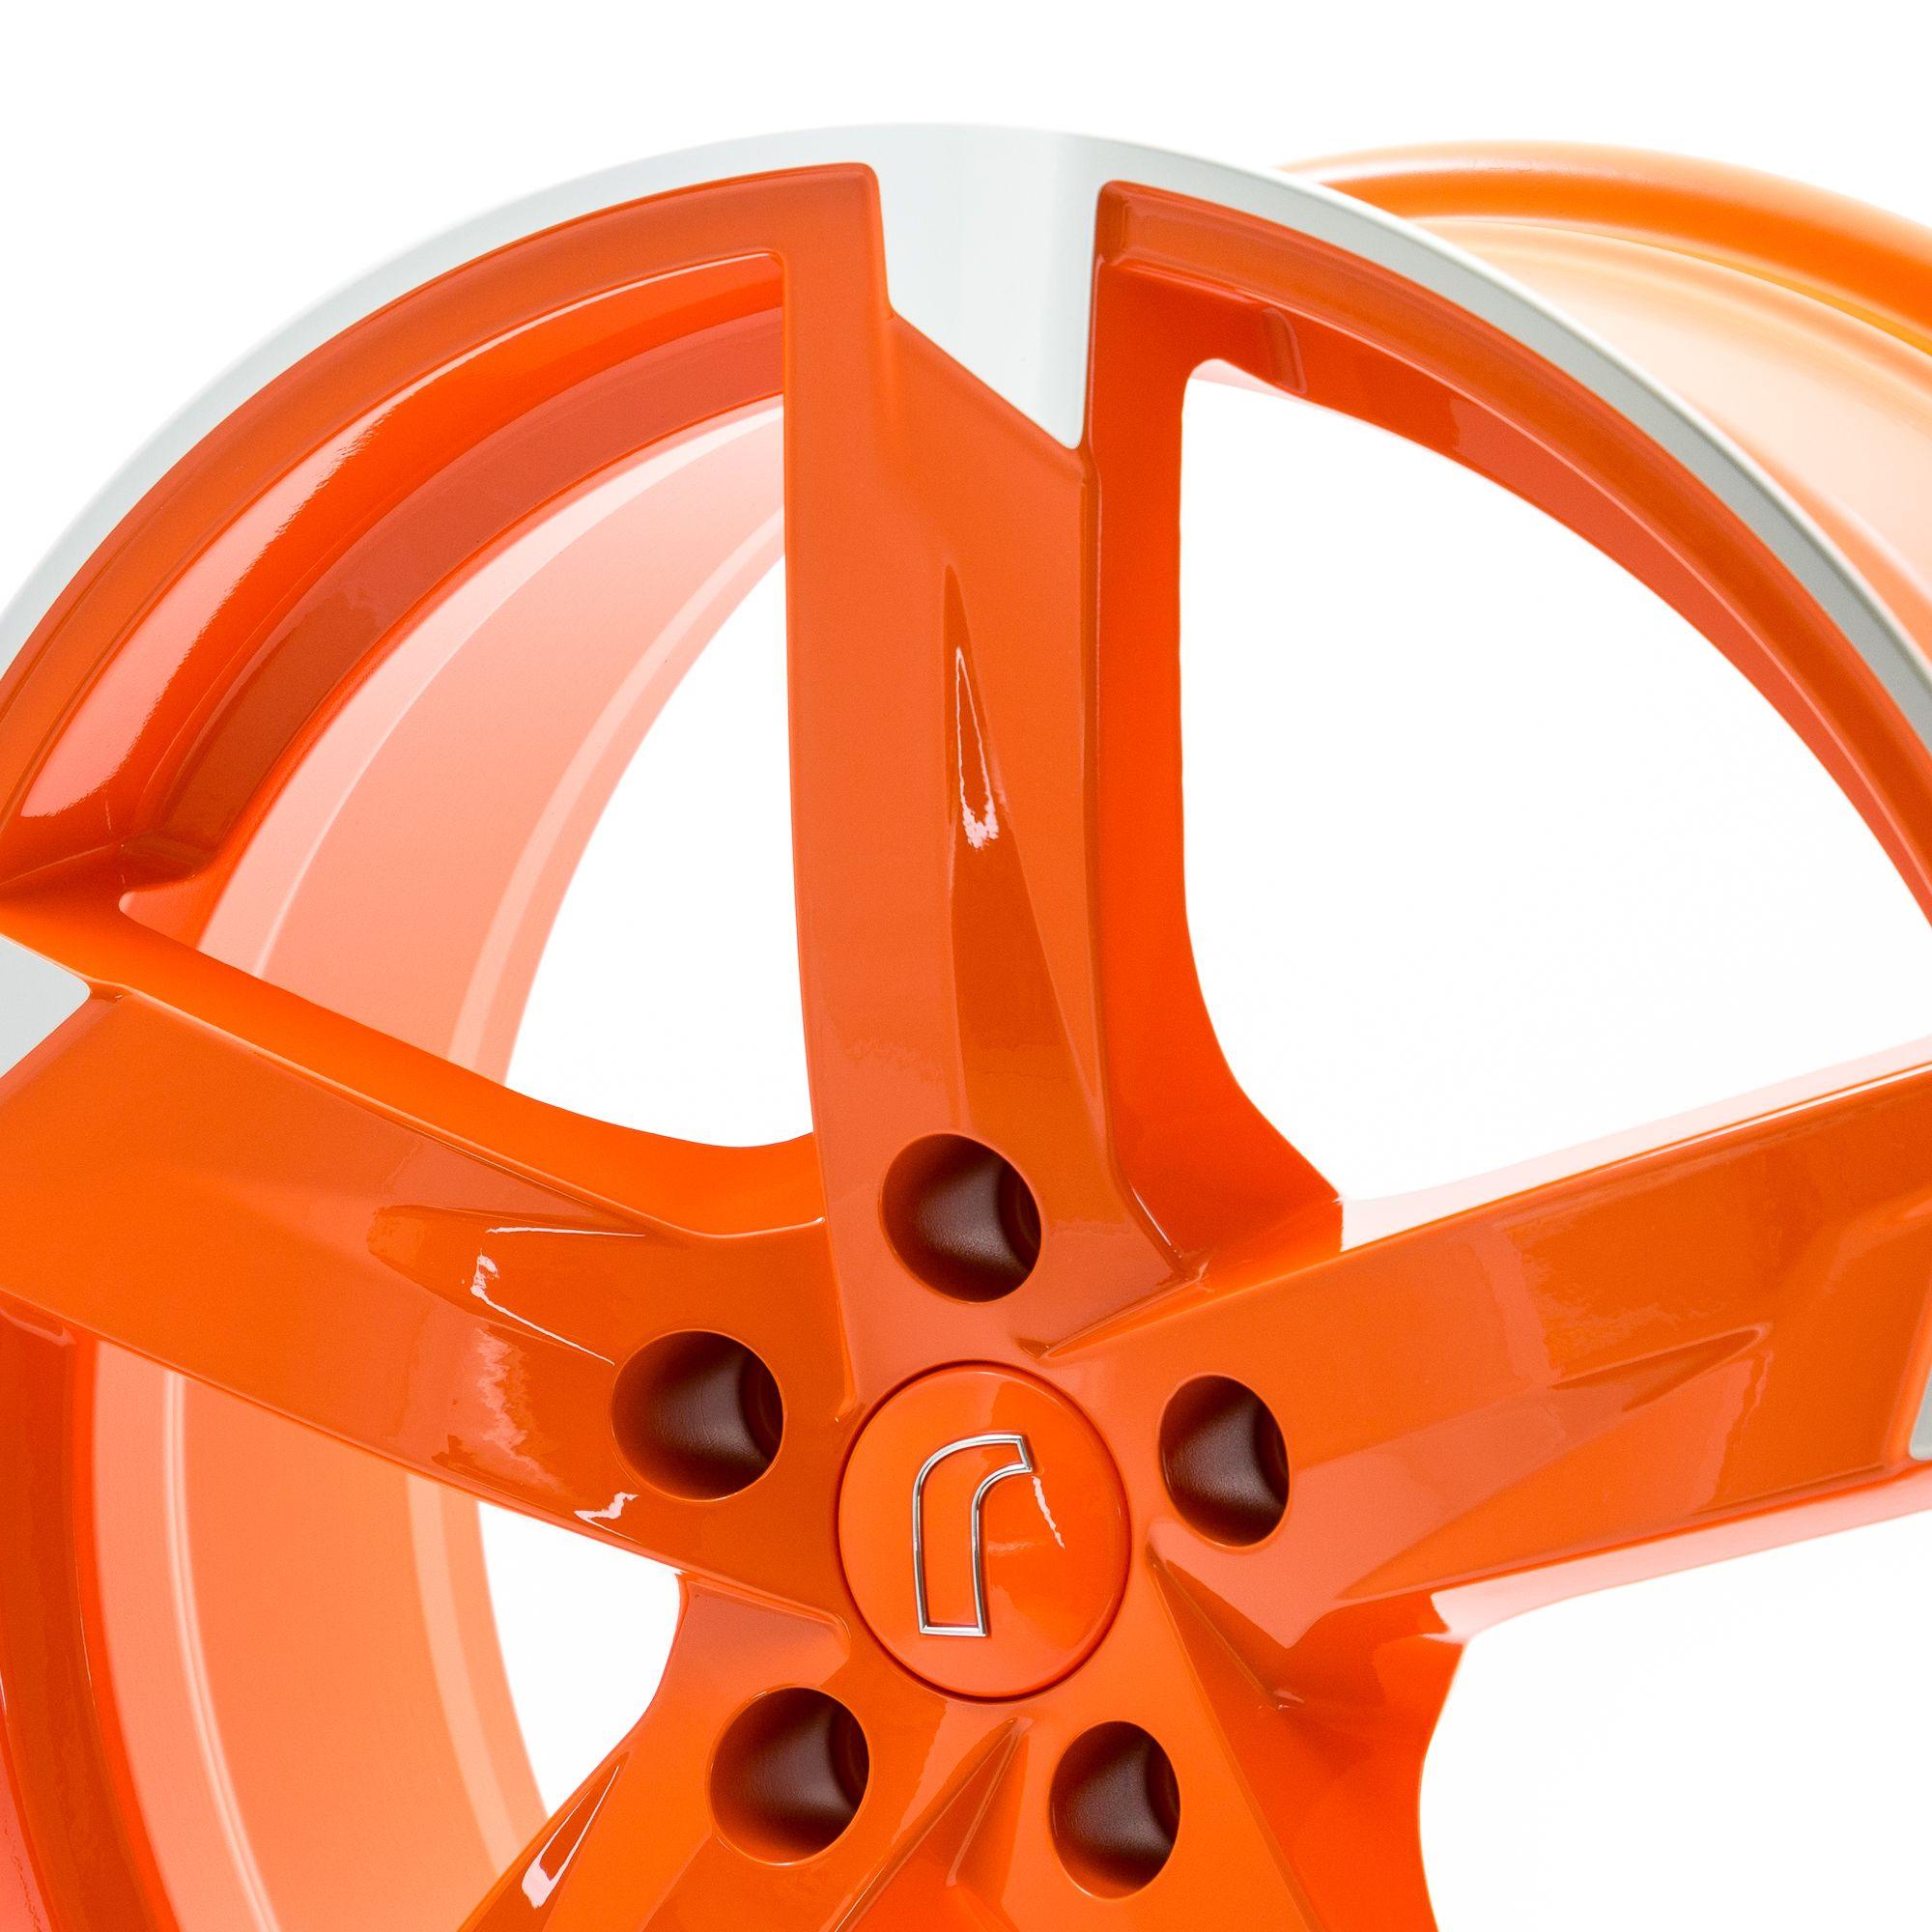 rondell 01rz felgen racing orange poliert mehrfarbig in. Black Bedroom Furniture Sets. Home Design Ideas